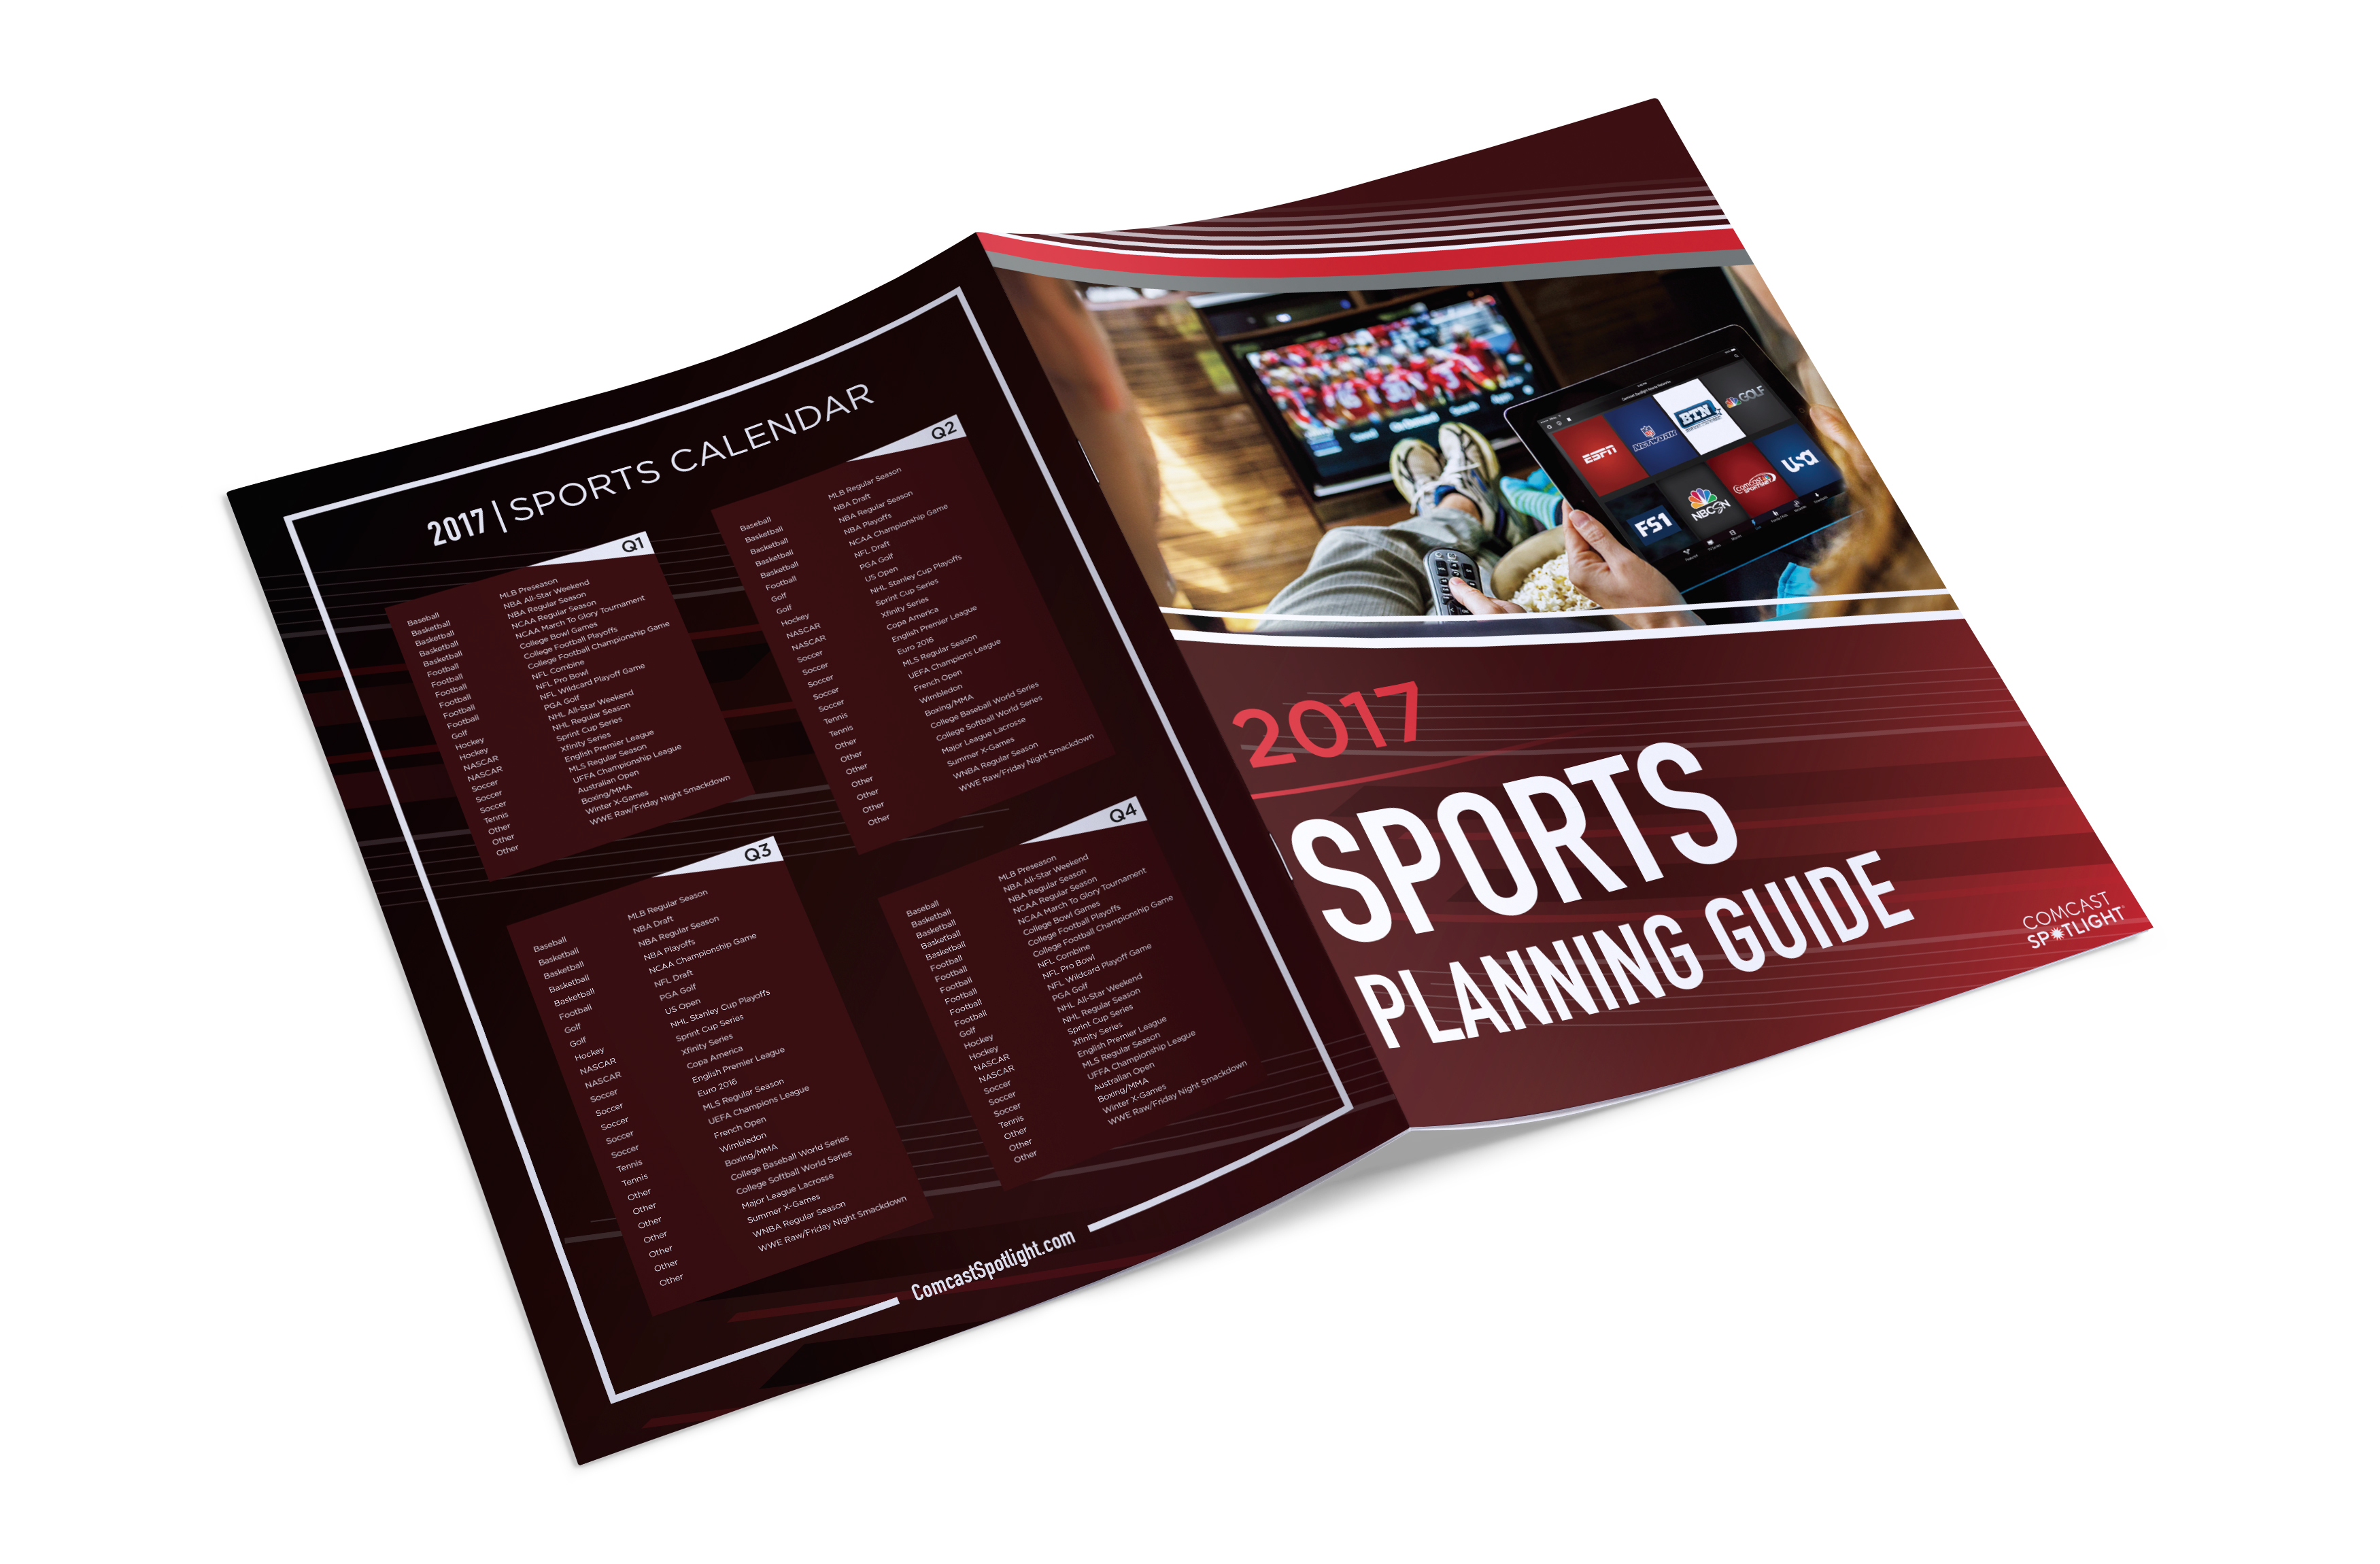 Comcast Spotlight Sports Planning Guide On Behance Basketball Football Golf Soccer Tennis